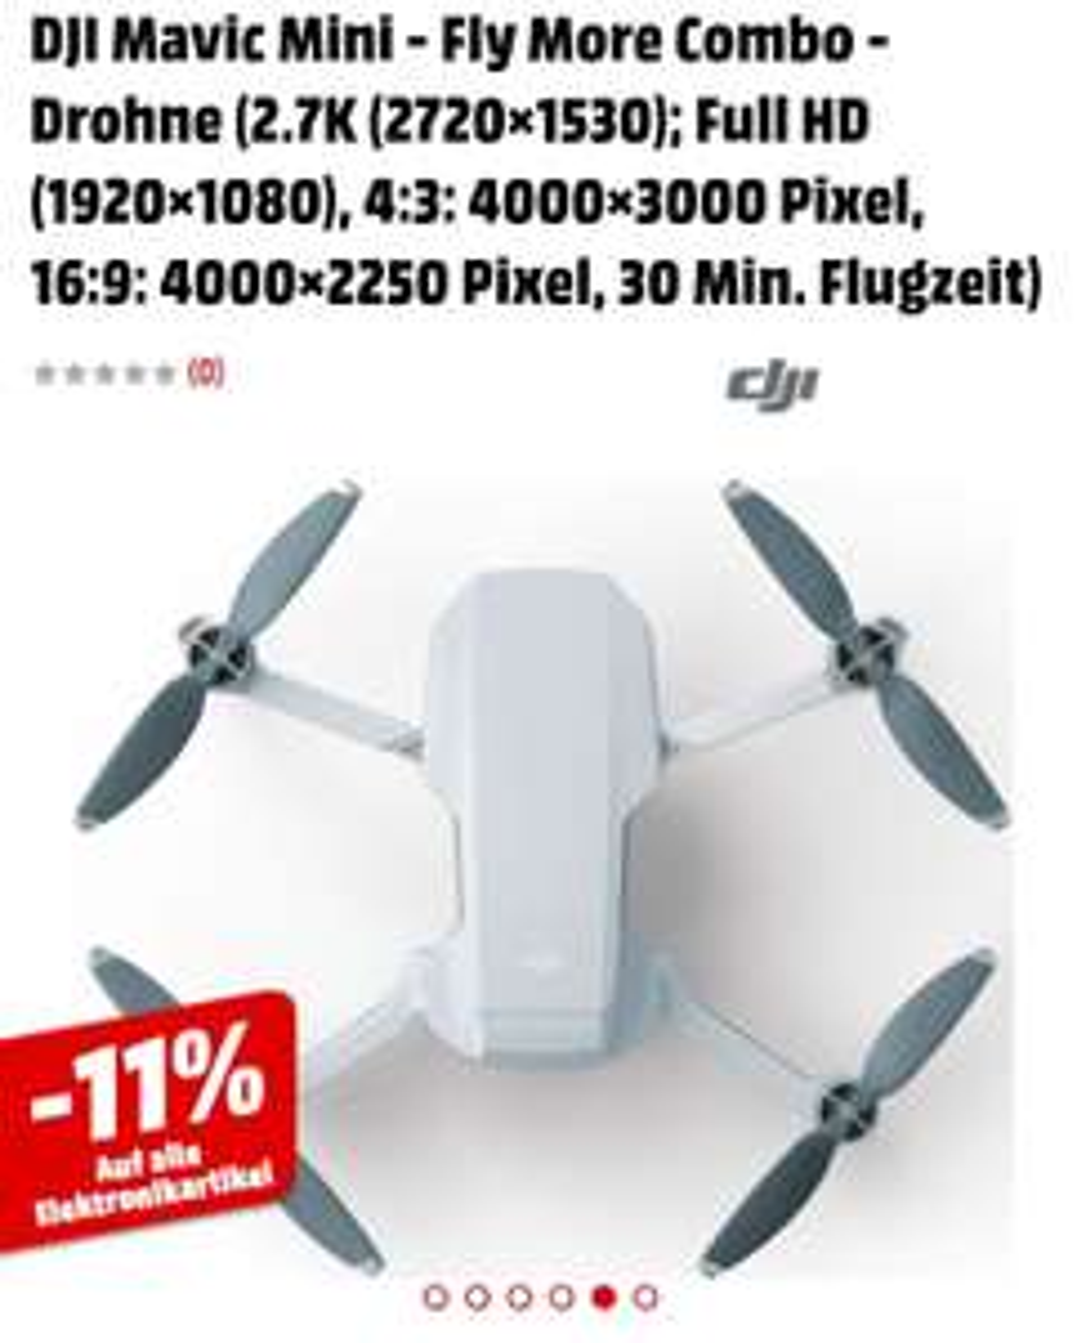 [Media Markt Schweiz] DJI Mavic Mini - Fly More Combo - Drohne